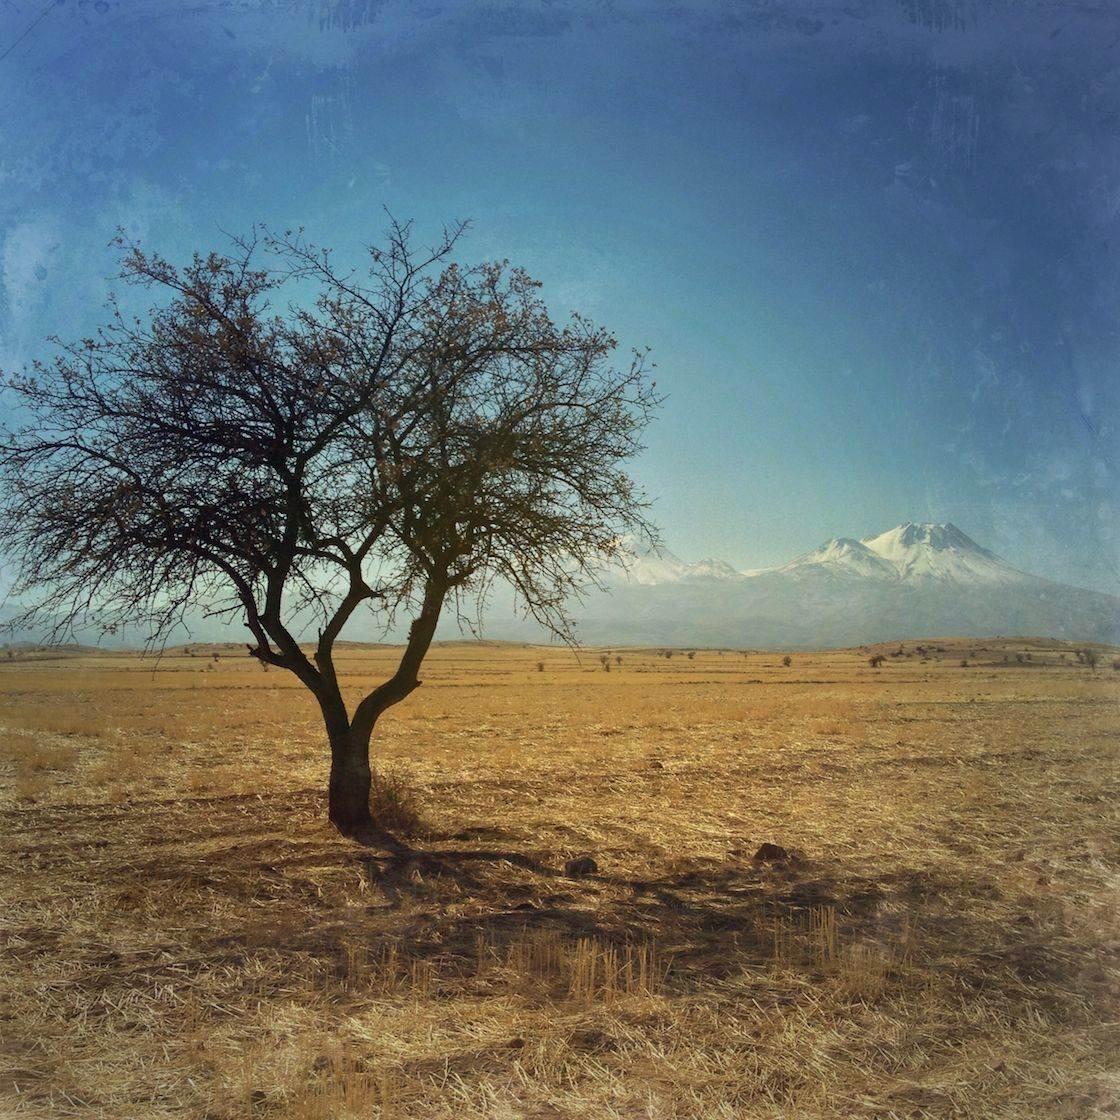 iPhone Photo of a Tree no script